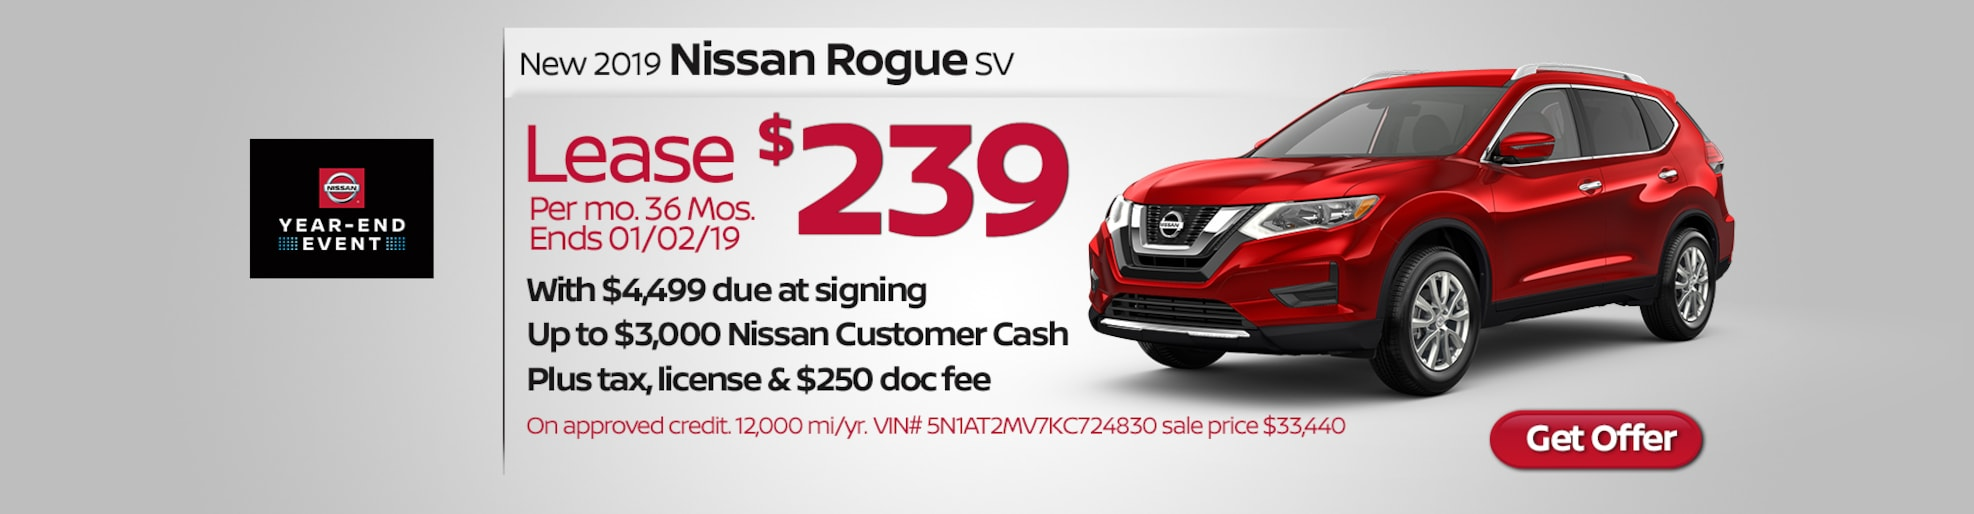 Jeff Wyler Nissan >> Jeff Wyler Nissan of Cincinnati | New and Used Nissan dealer in Cincinnati Colerain Ohio